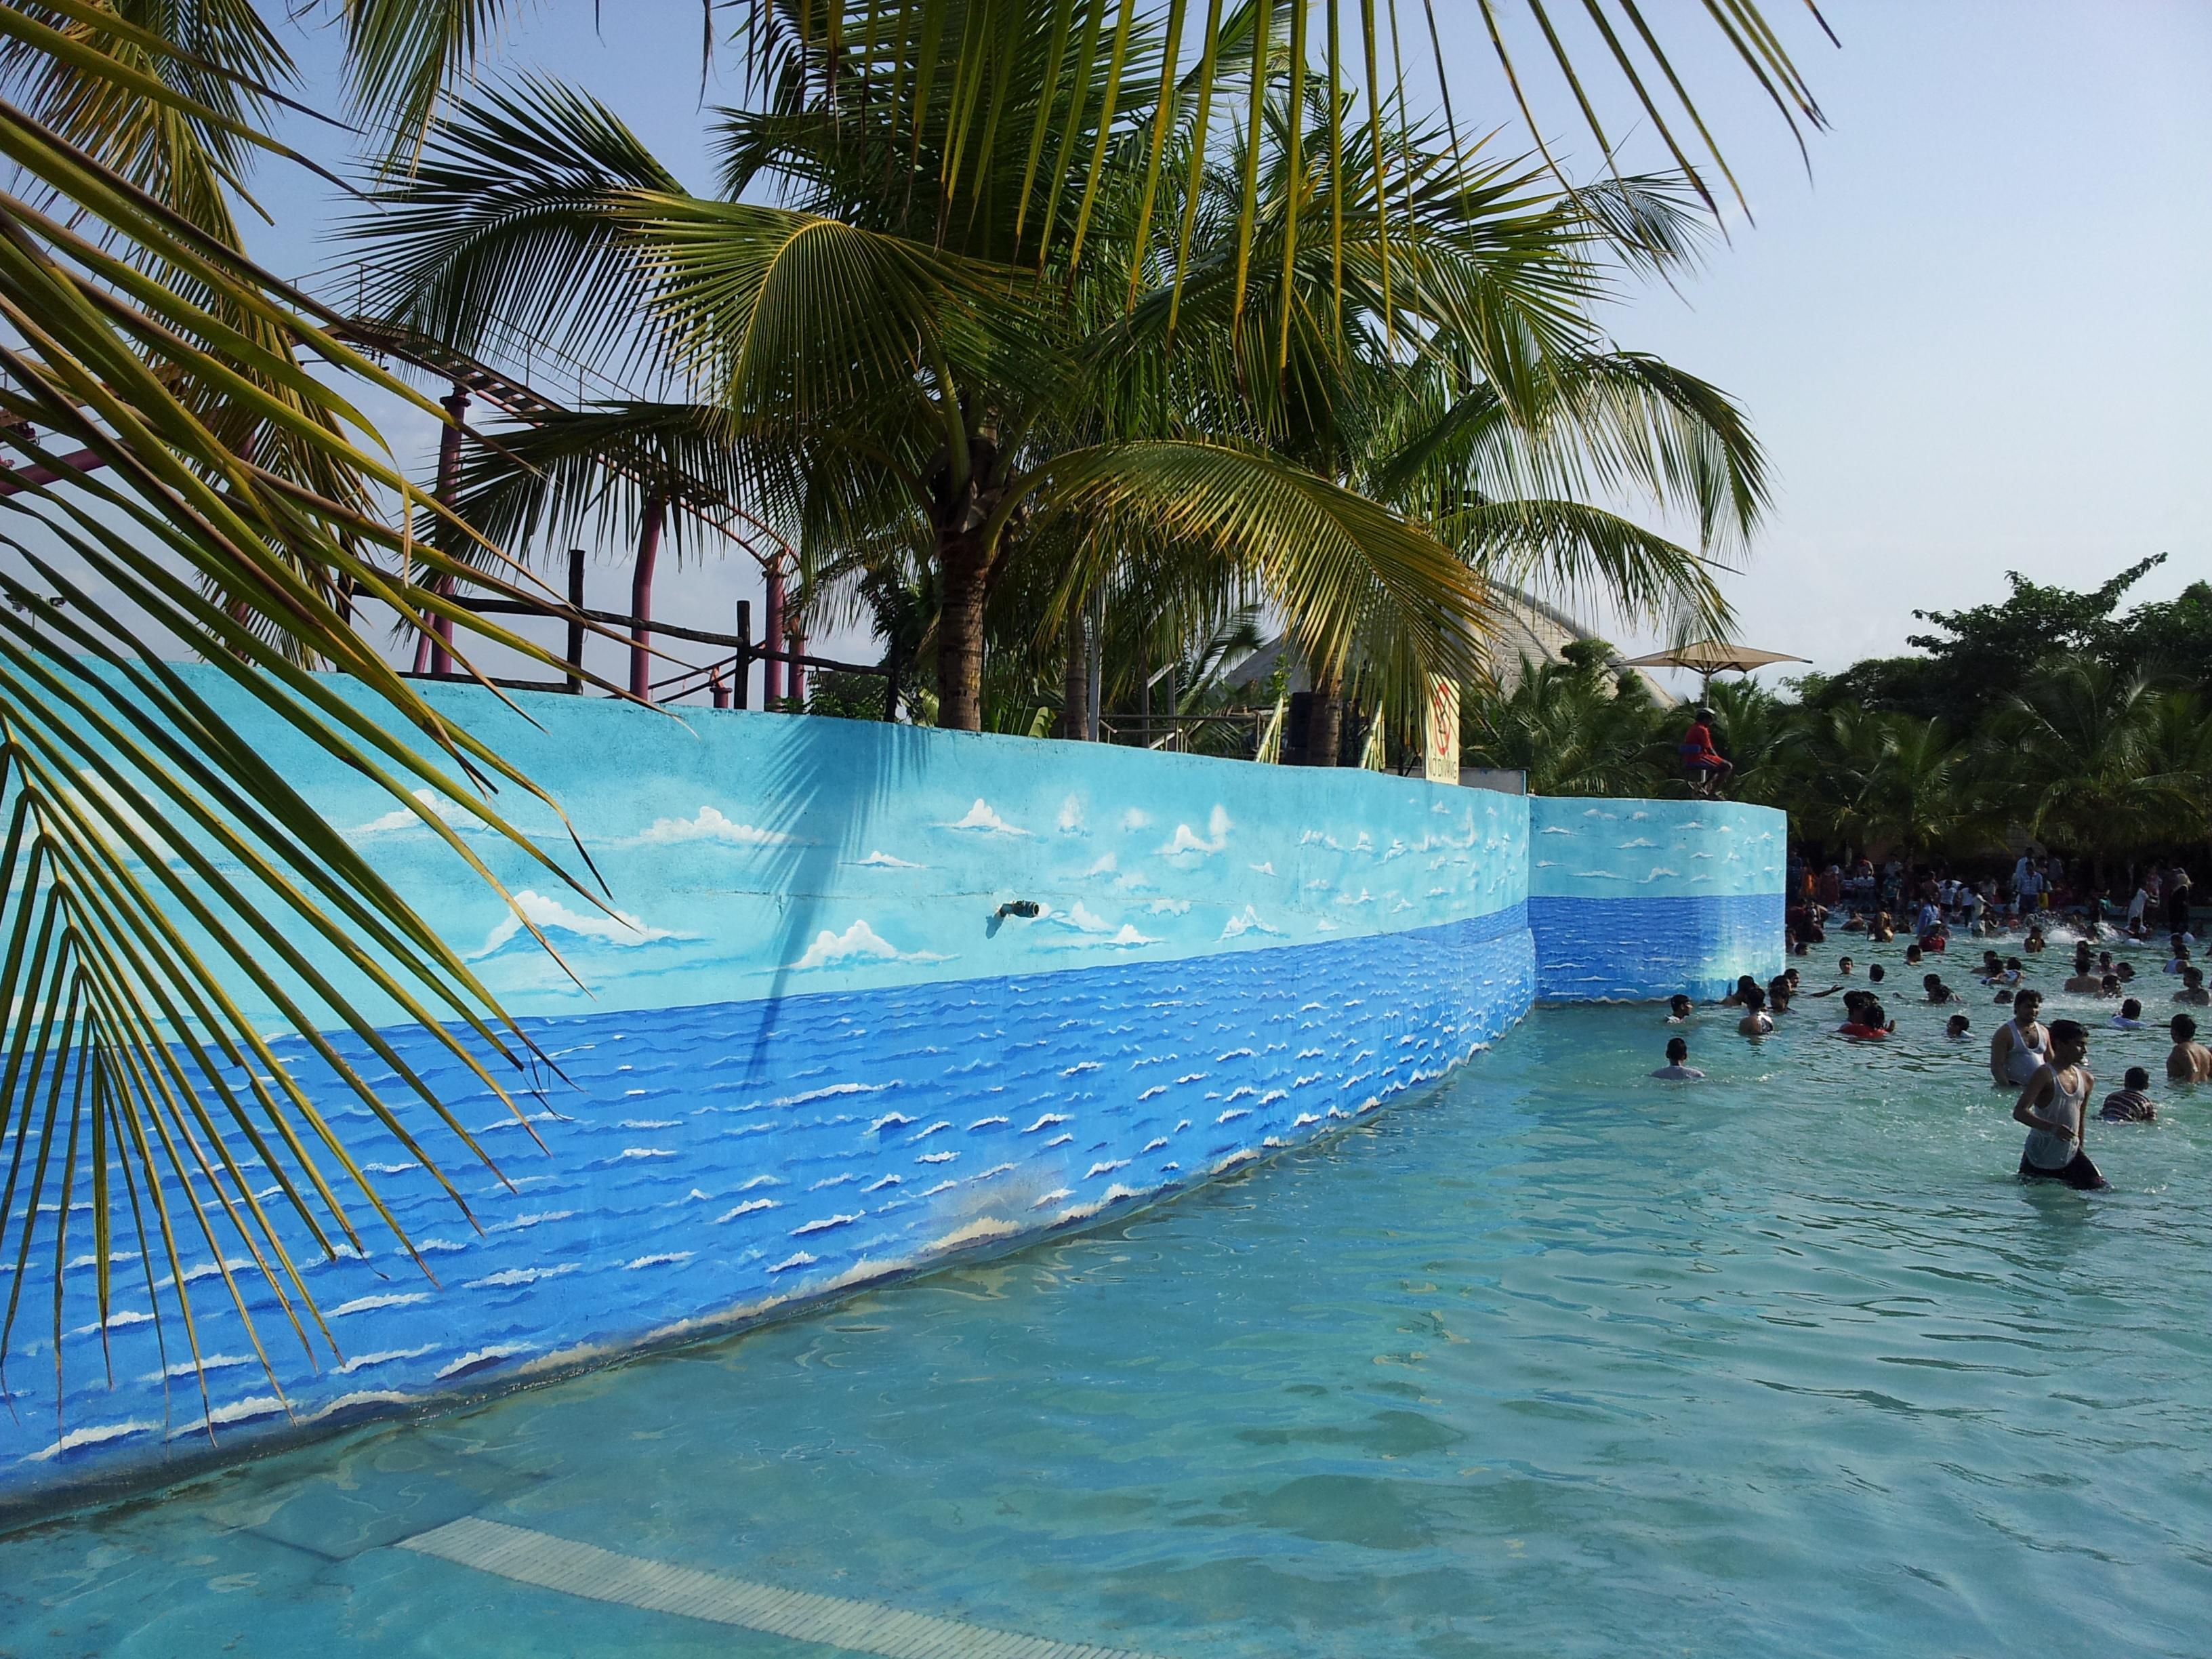 Fileaquacity Pool At Innovative Film City Bangalore 164324jpg